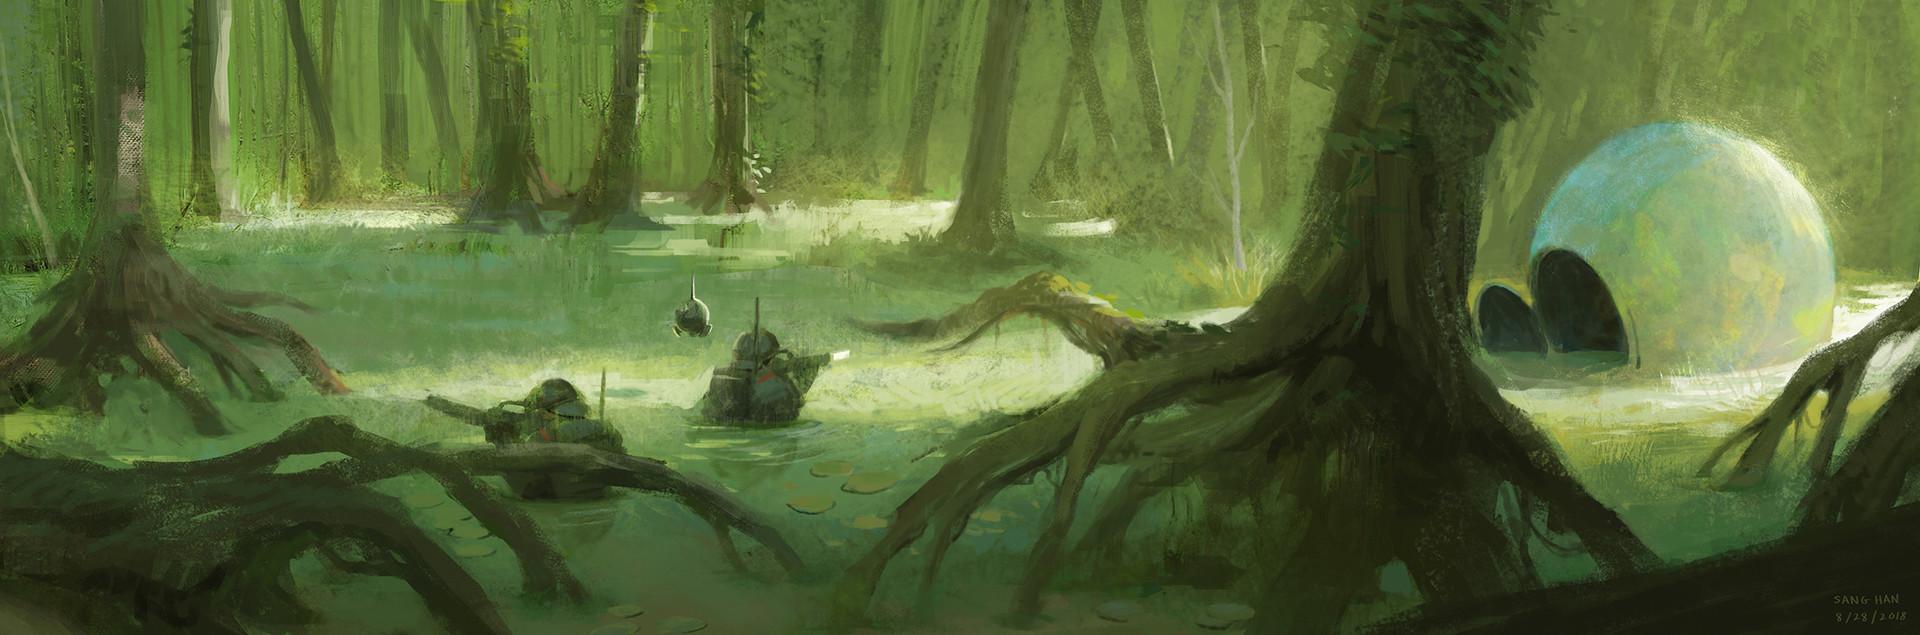 Sang han swampland